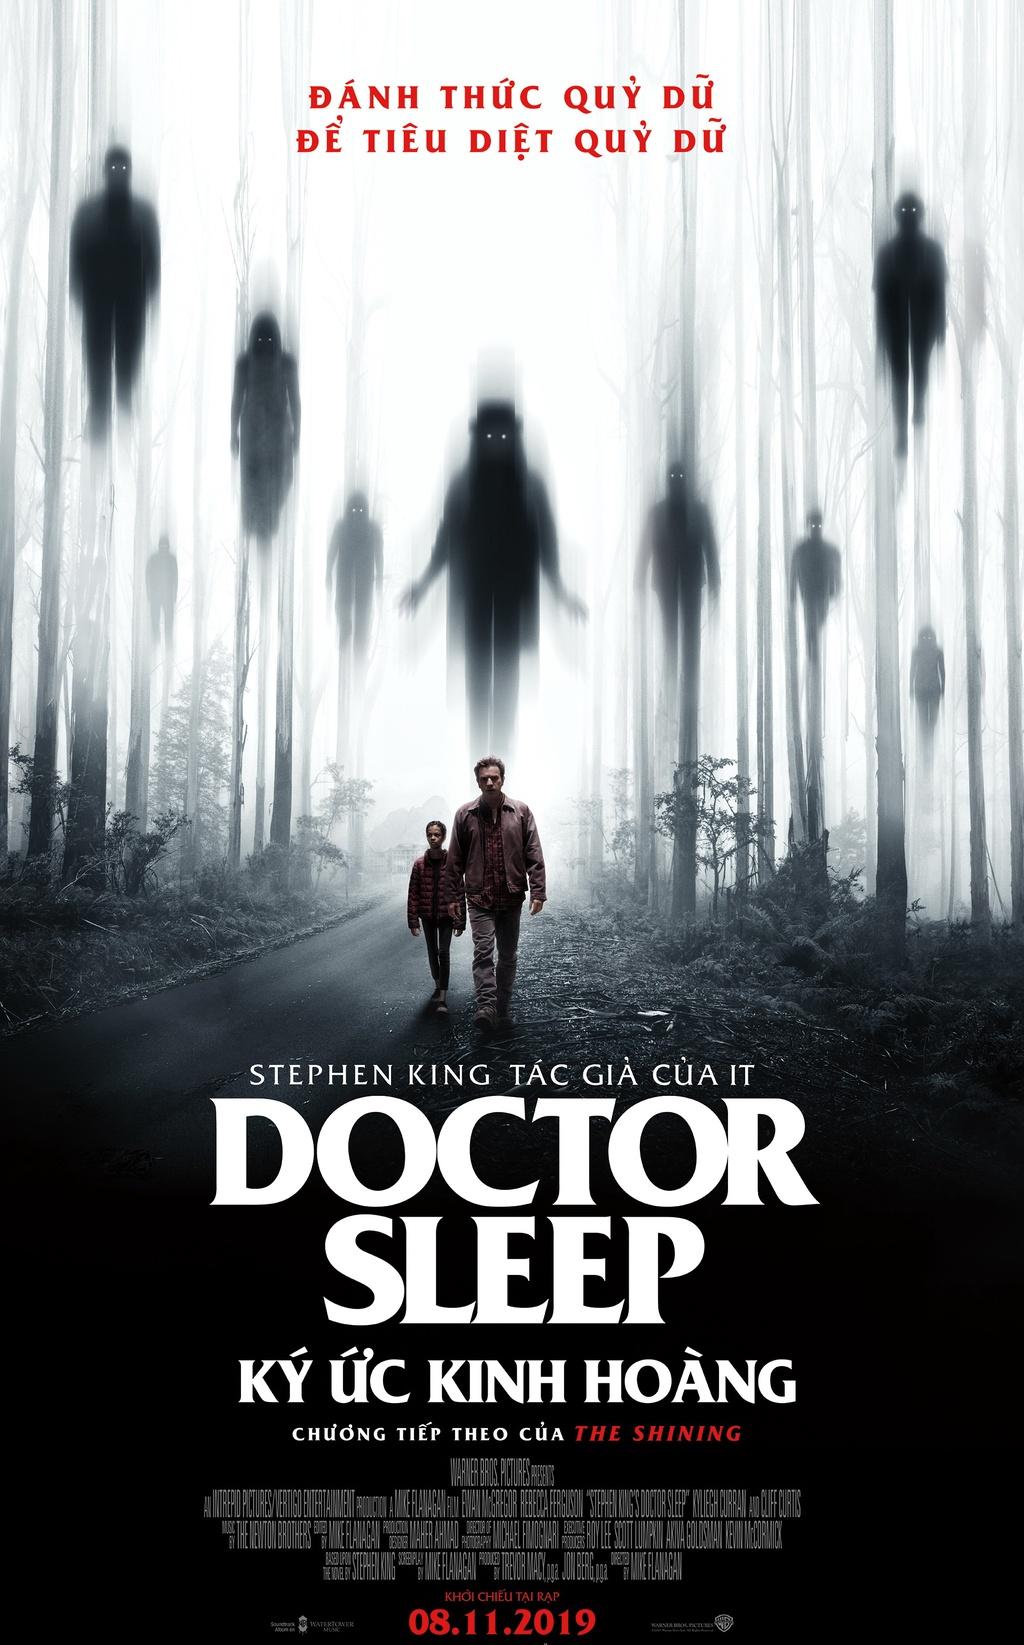 'Doctor Sleep' - tran chien tam linh cua nguoi co nang luc sieu nhien hinh anh 1